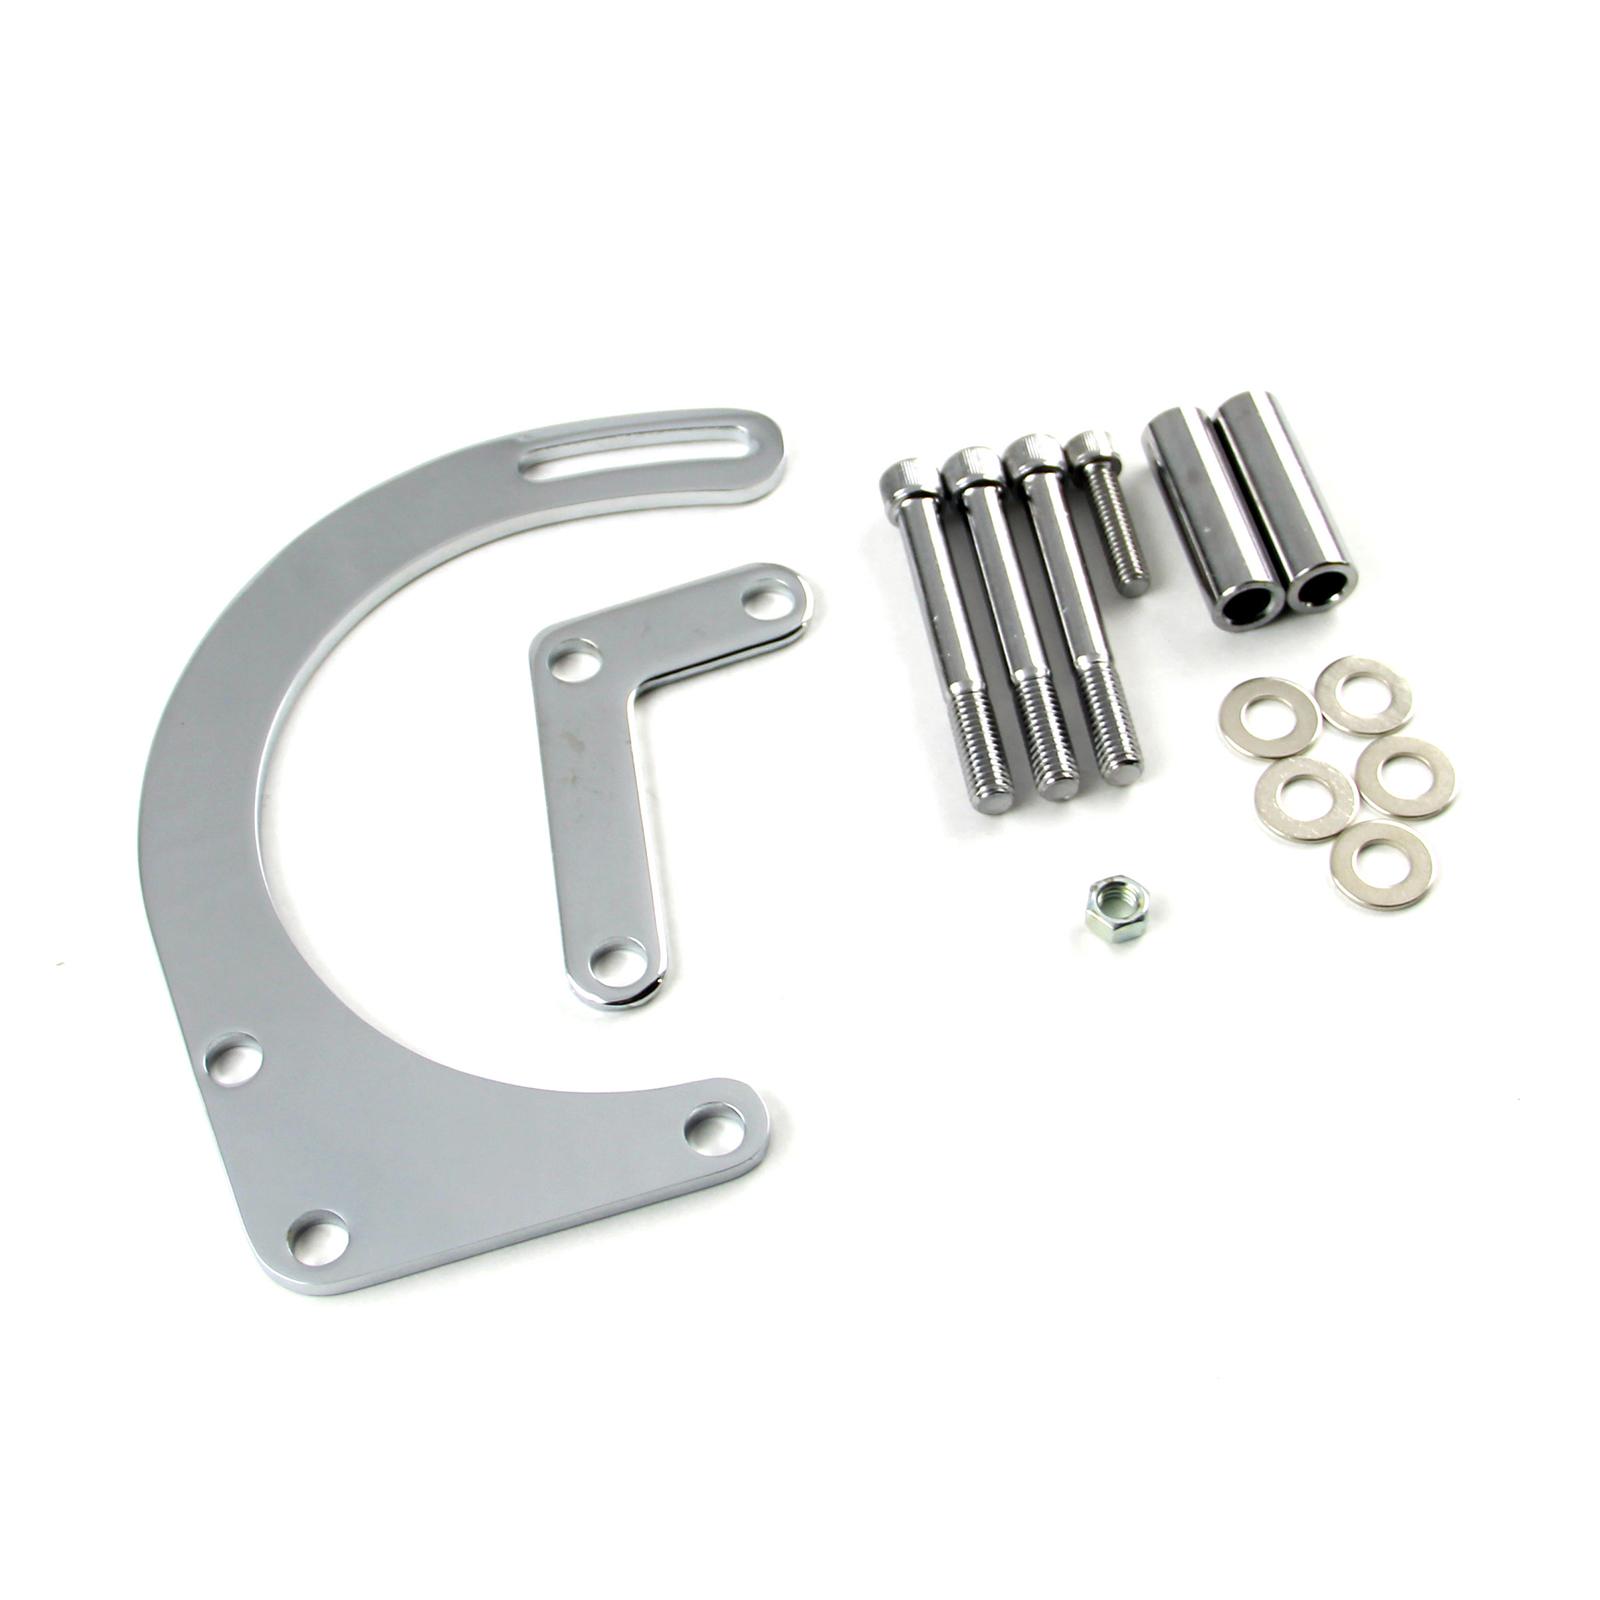 Chevy SBC 350 Swp Low Mount LH Side Alternator Bracket Kit Chrome